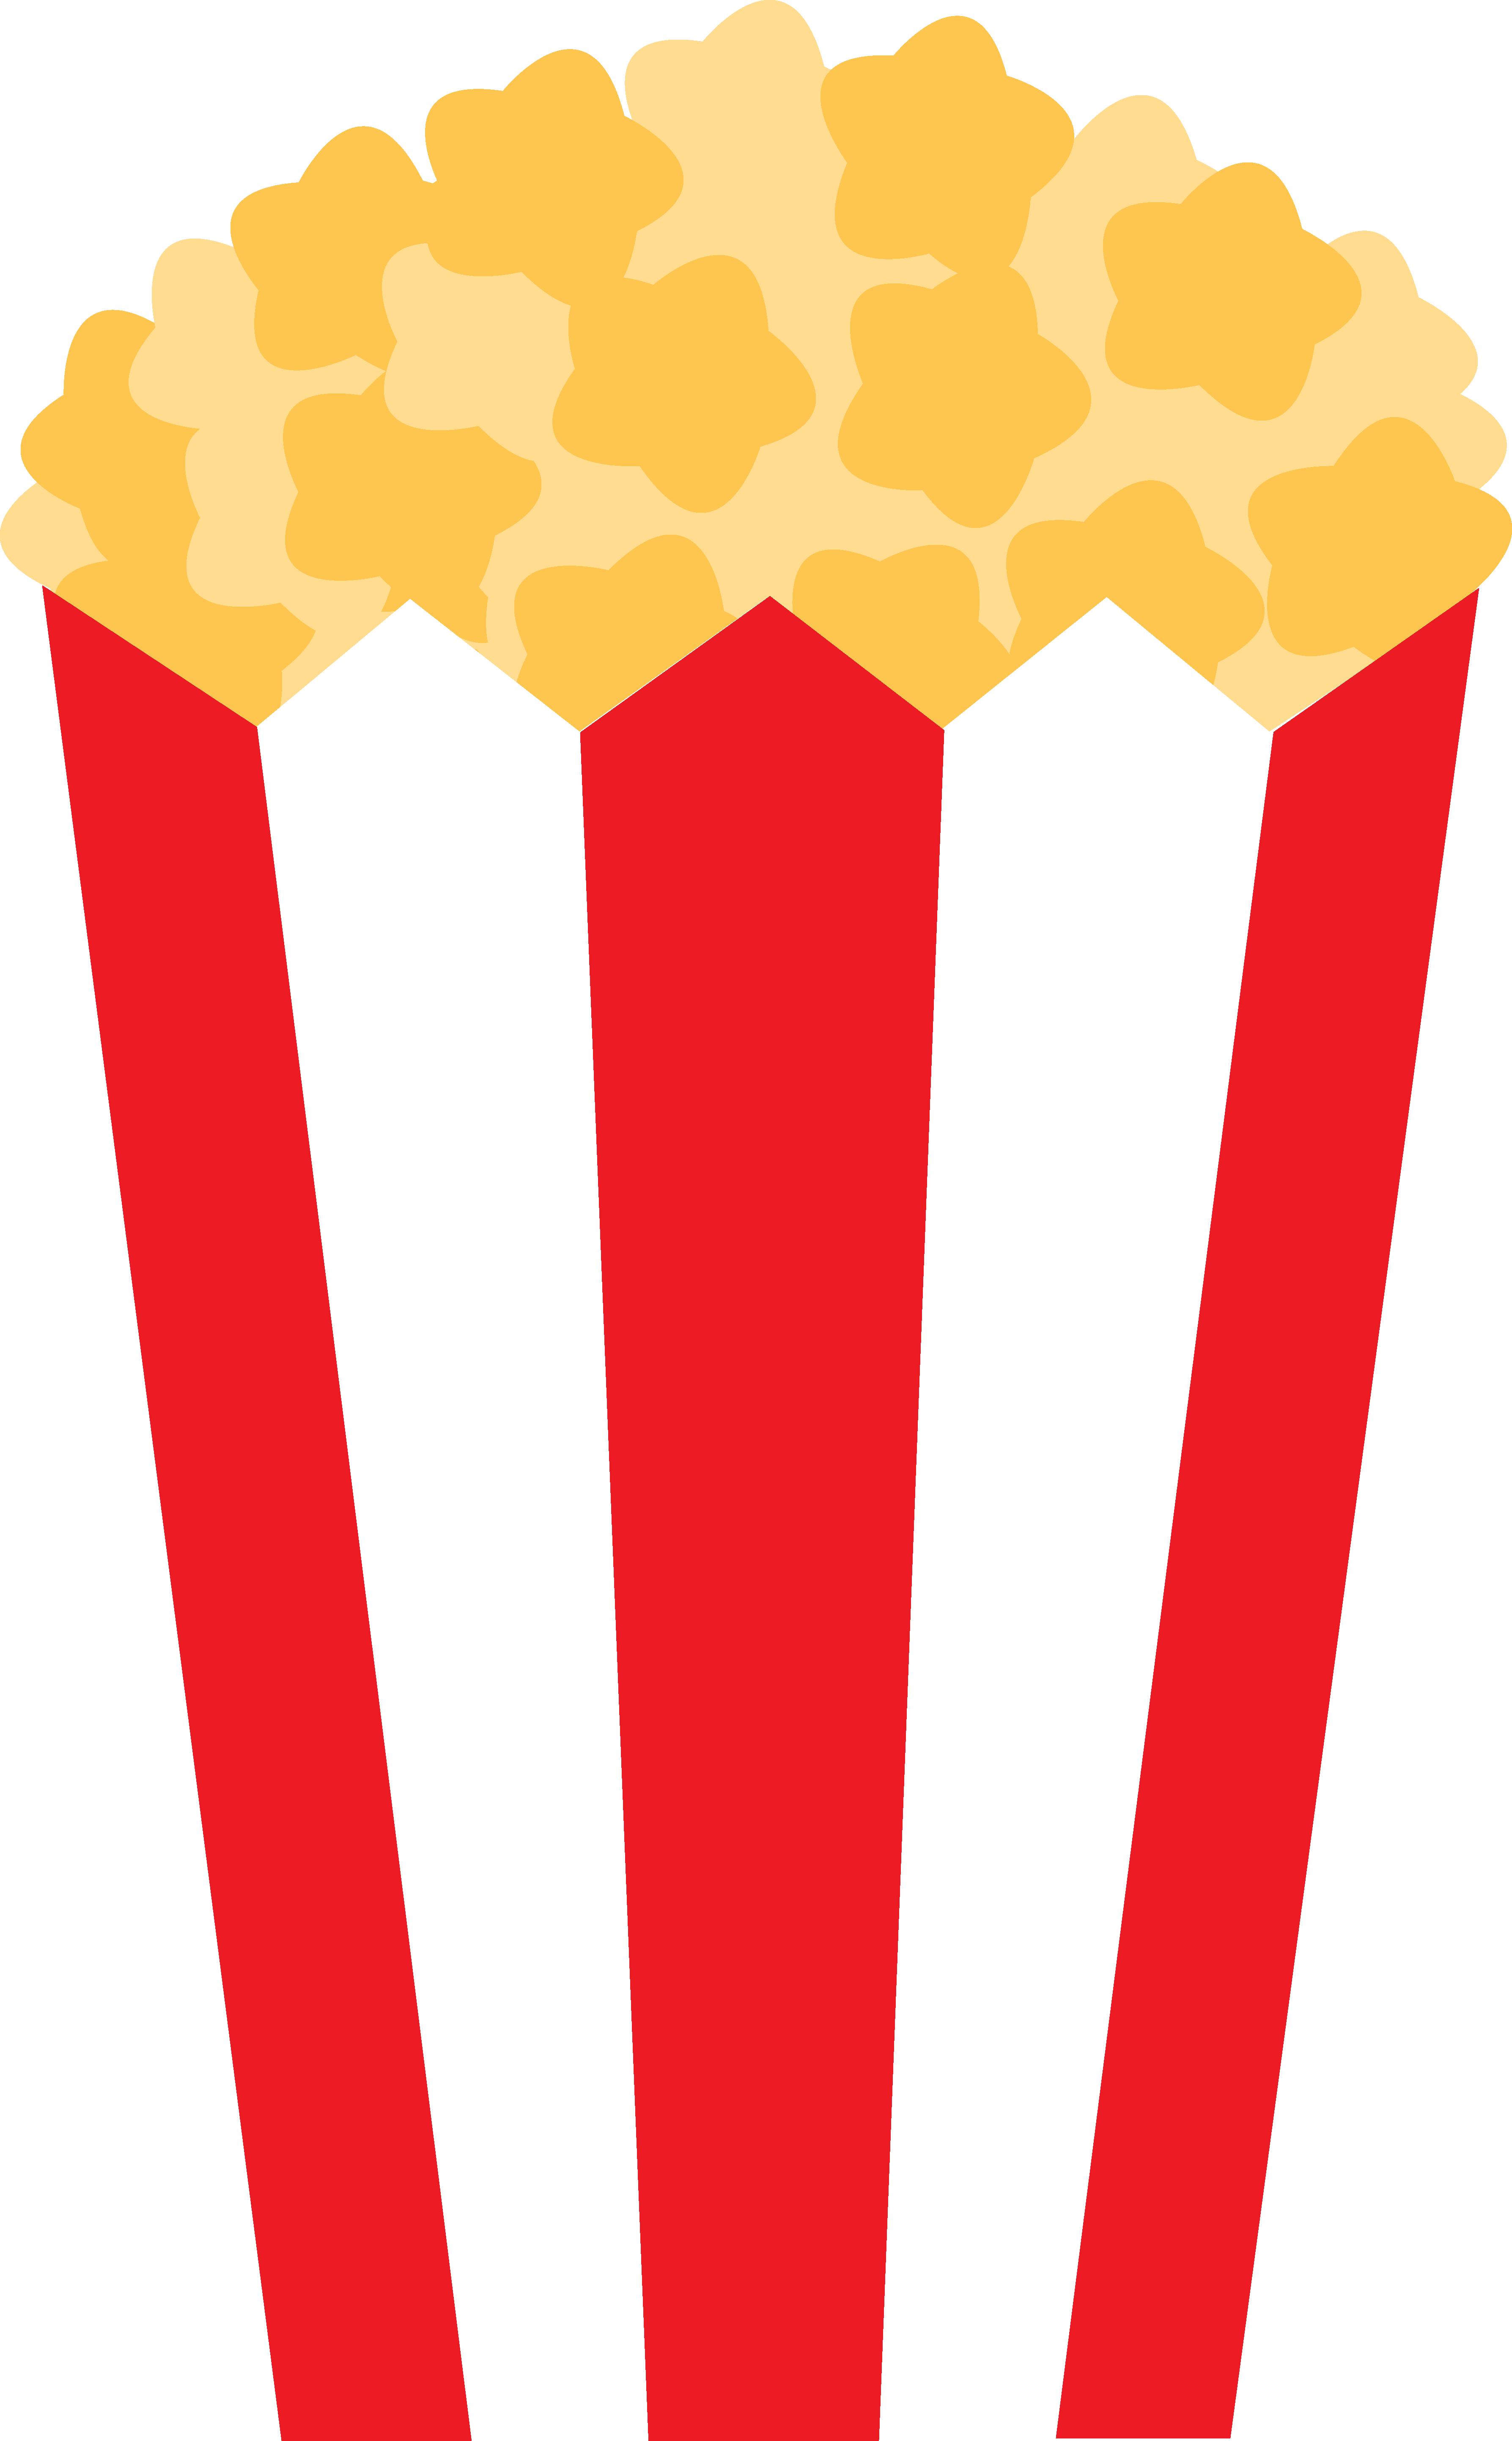 3575x5770 Bag Of Popcorn